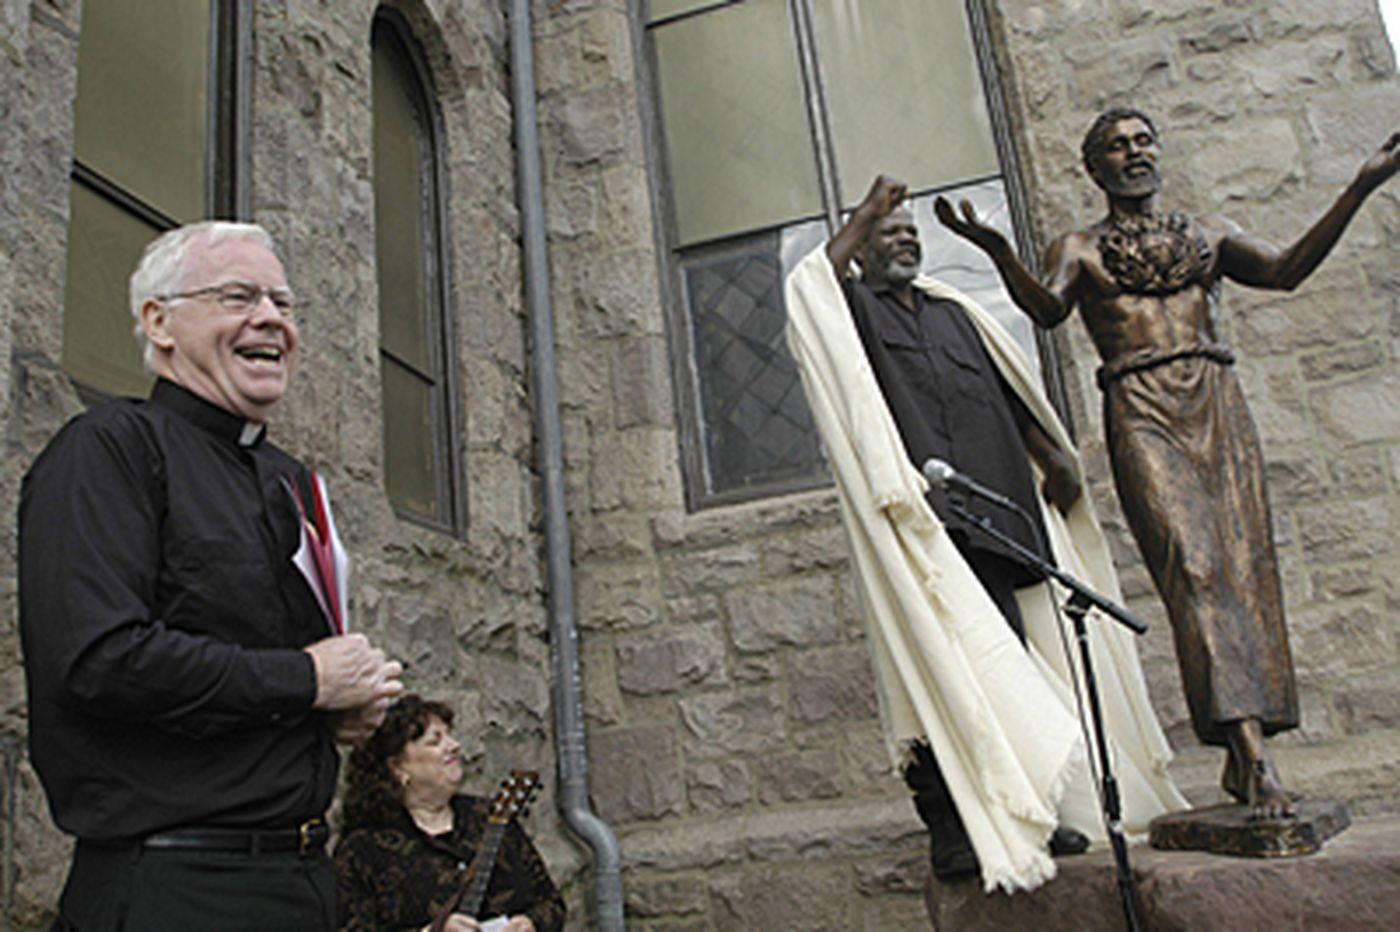 Monica Yant Kinney: Film portrays Camden's rebel priest